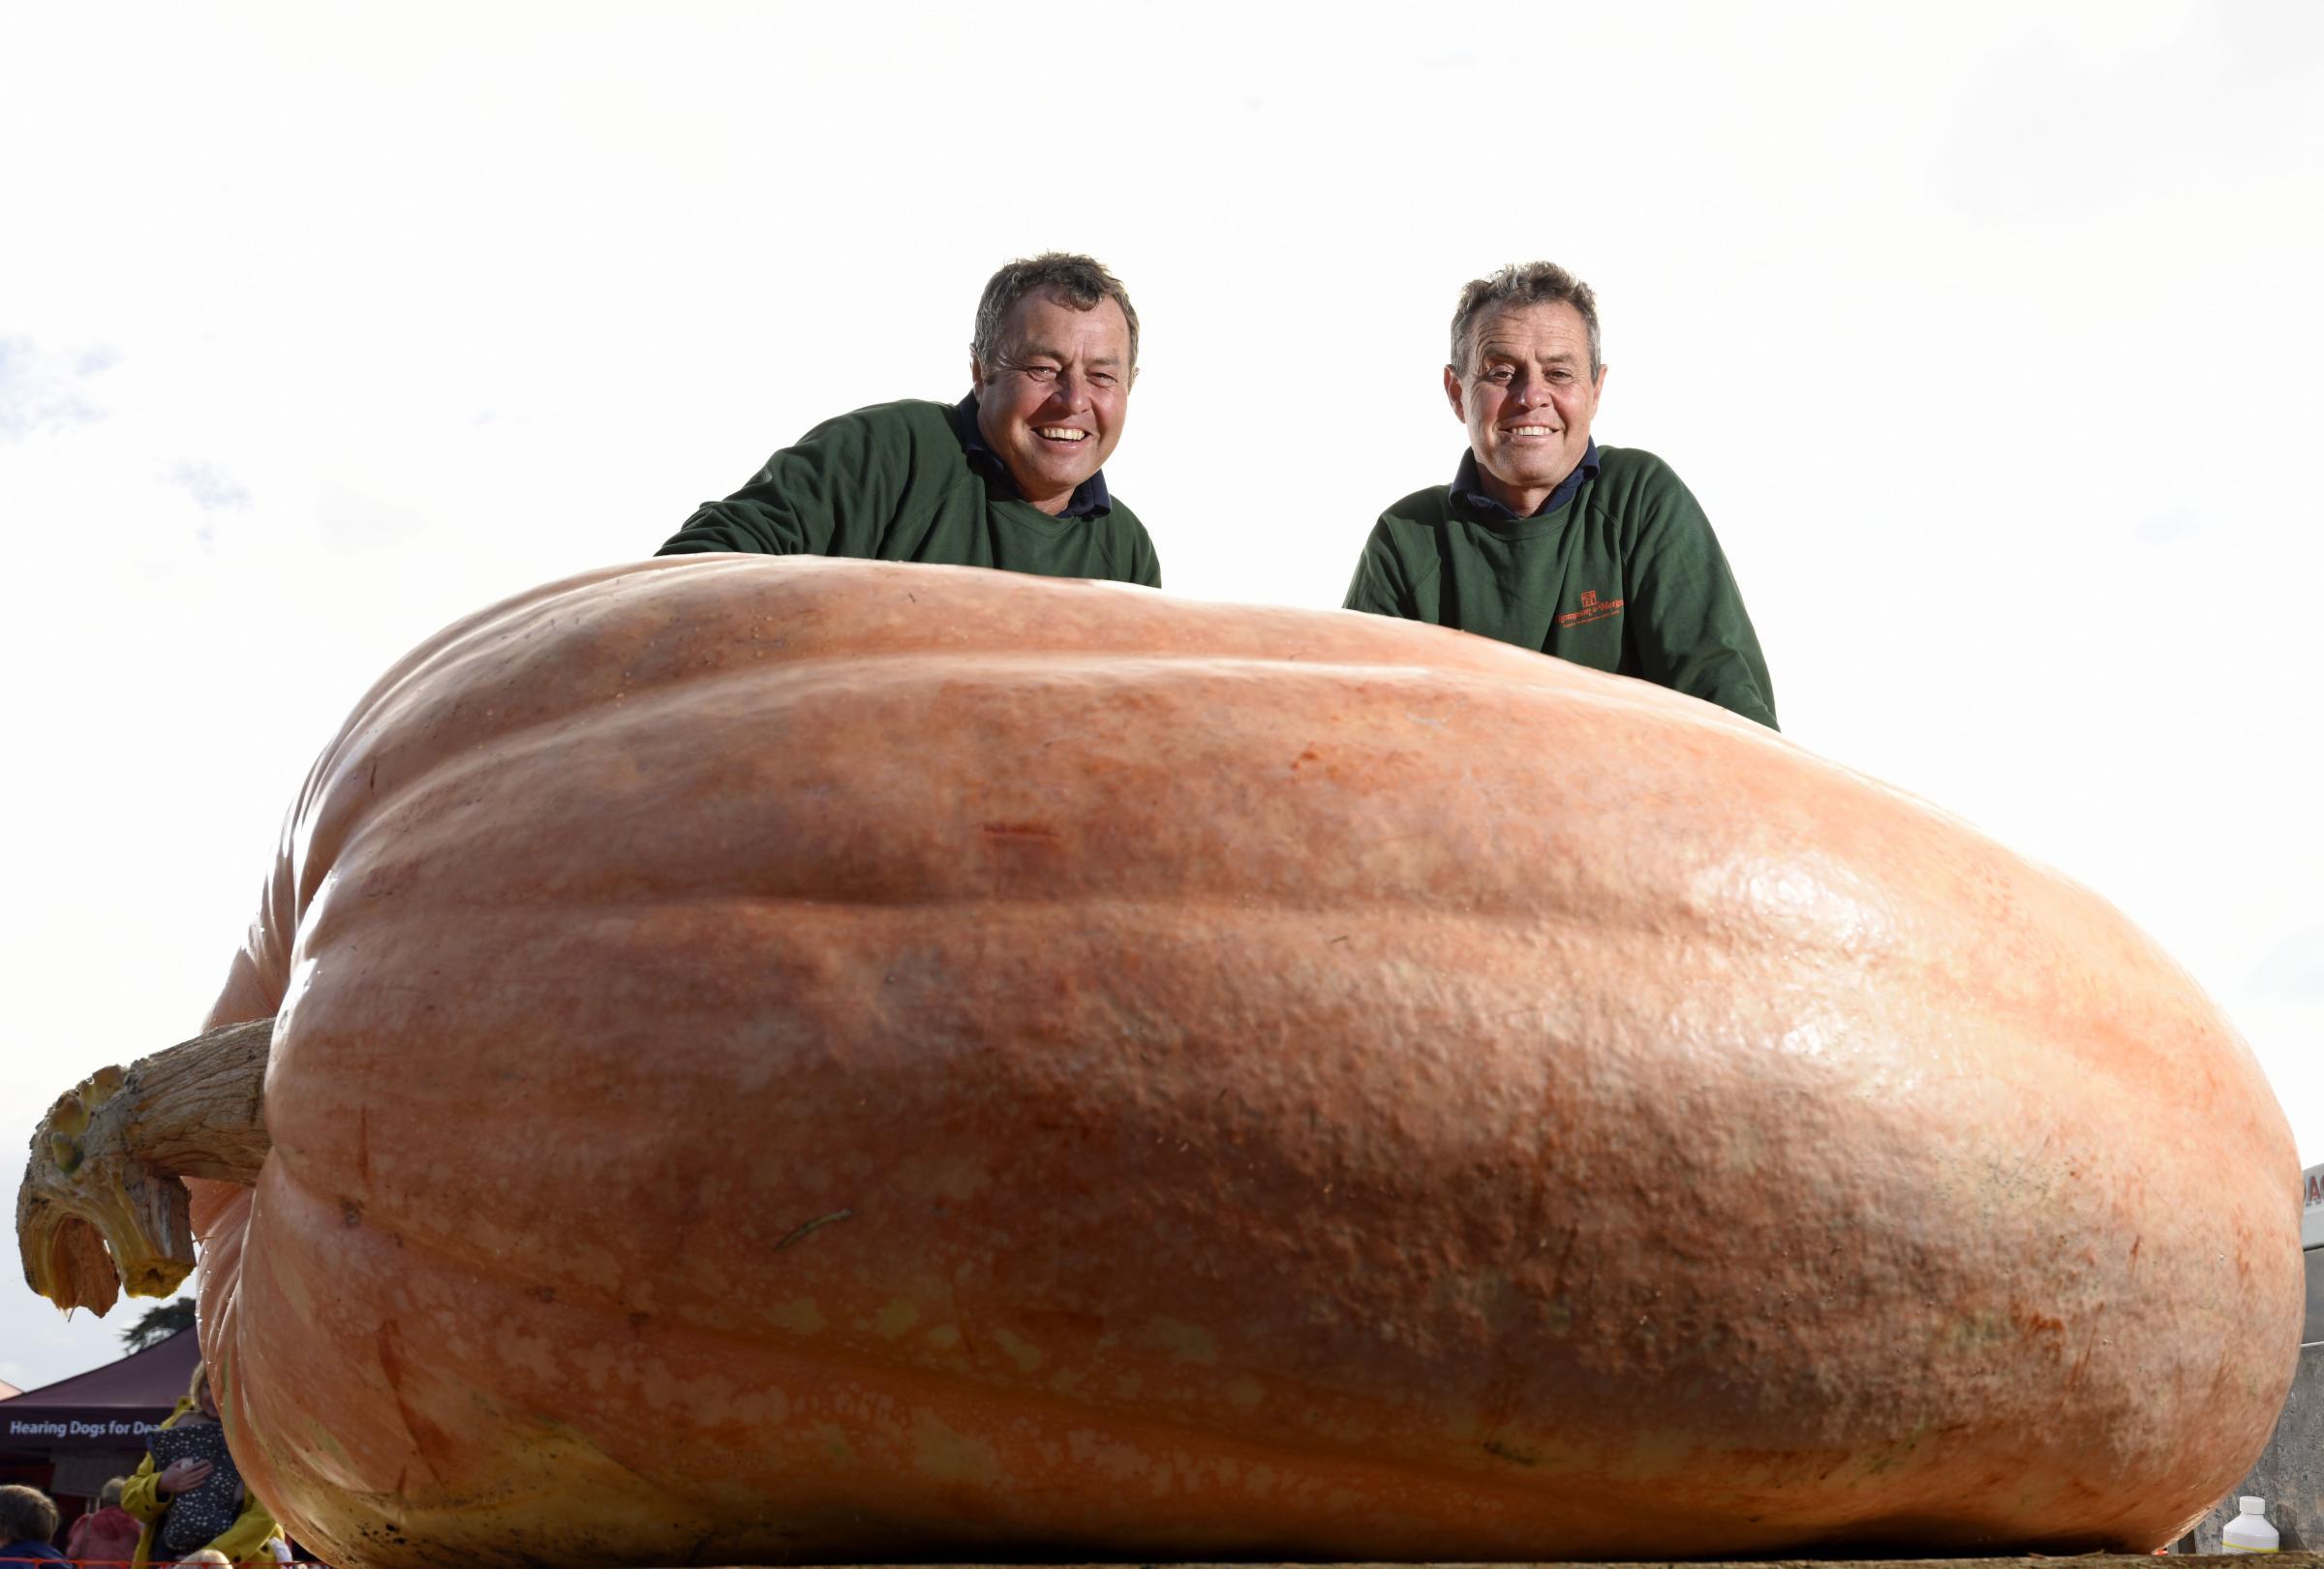 Анал фото овощи гиганты92